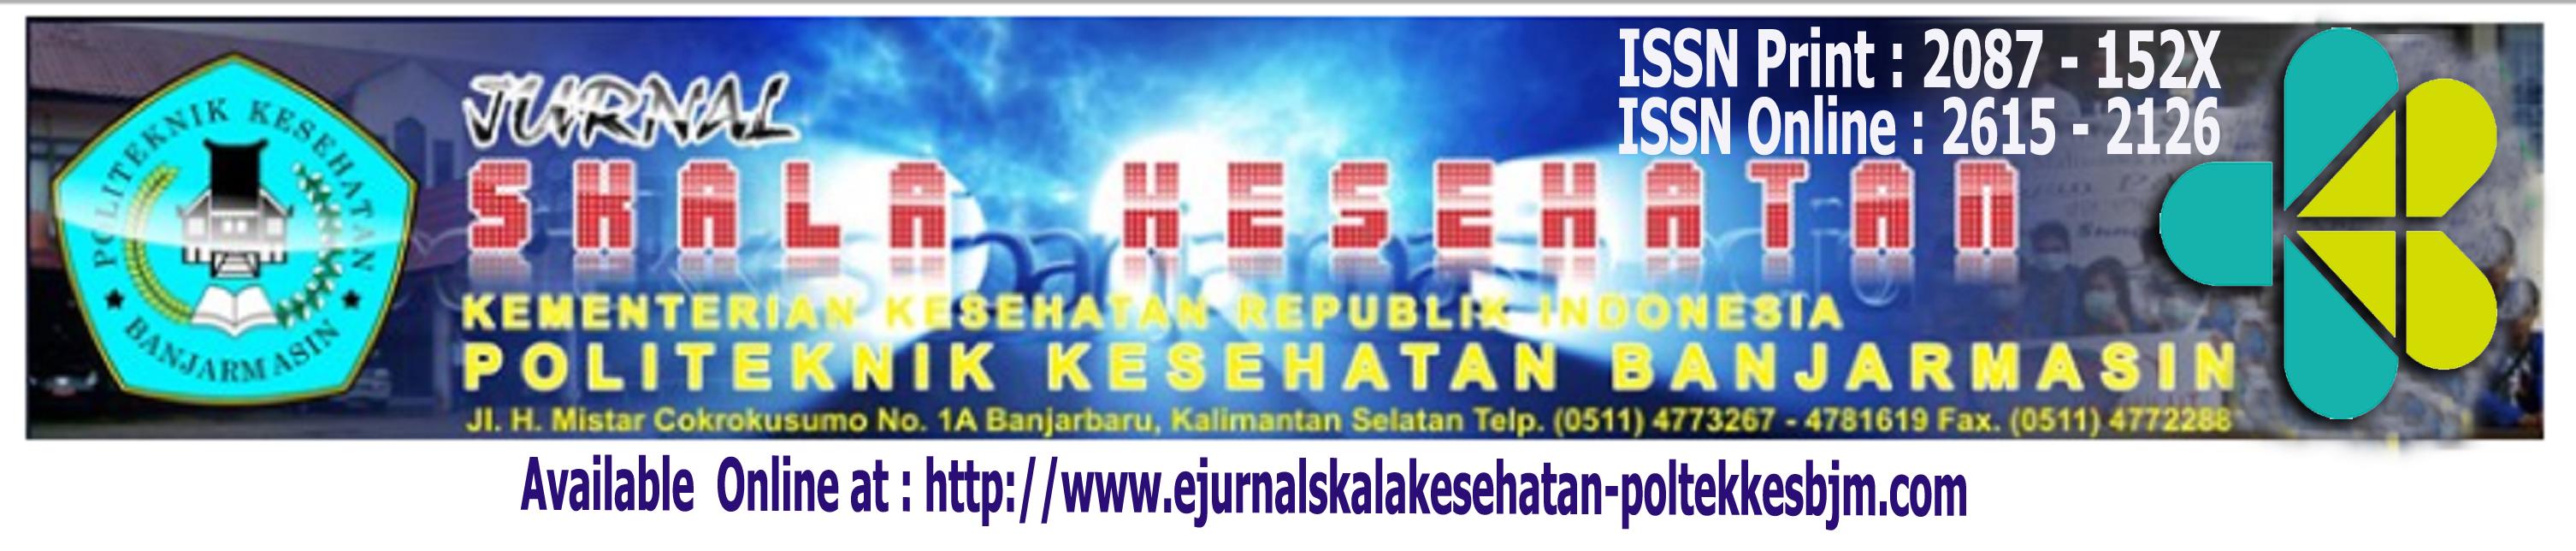 Analisis Faktor Risiko Wasting Pada Balita Di Wilayah Kerja Puskesmas Idi Rayeuk Kabupaten Aceh Timur Tahun 2019 Jurnal Skala Kesehatan